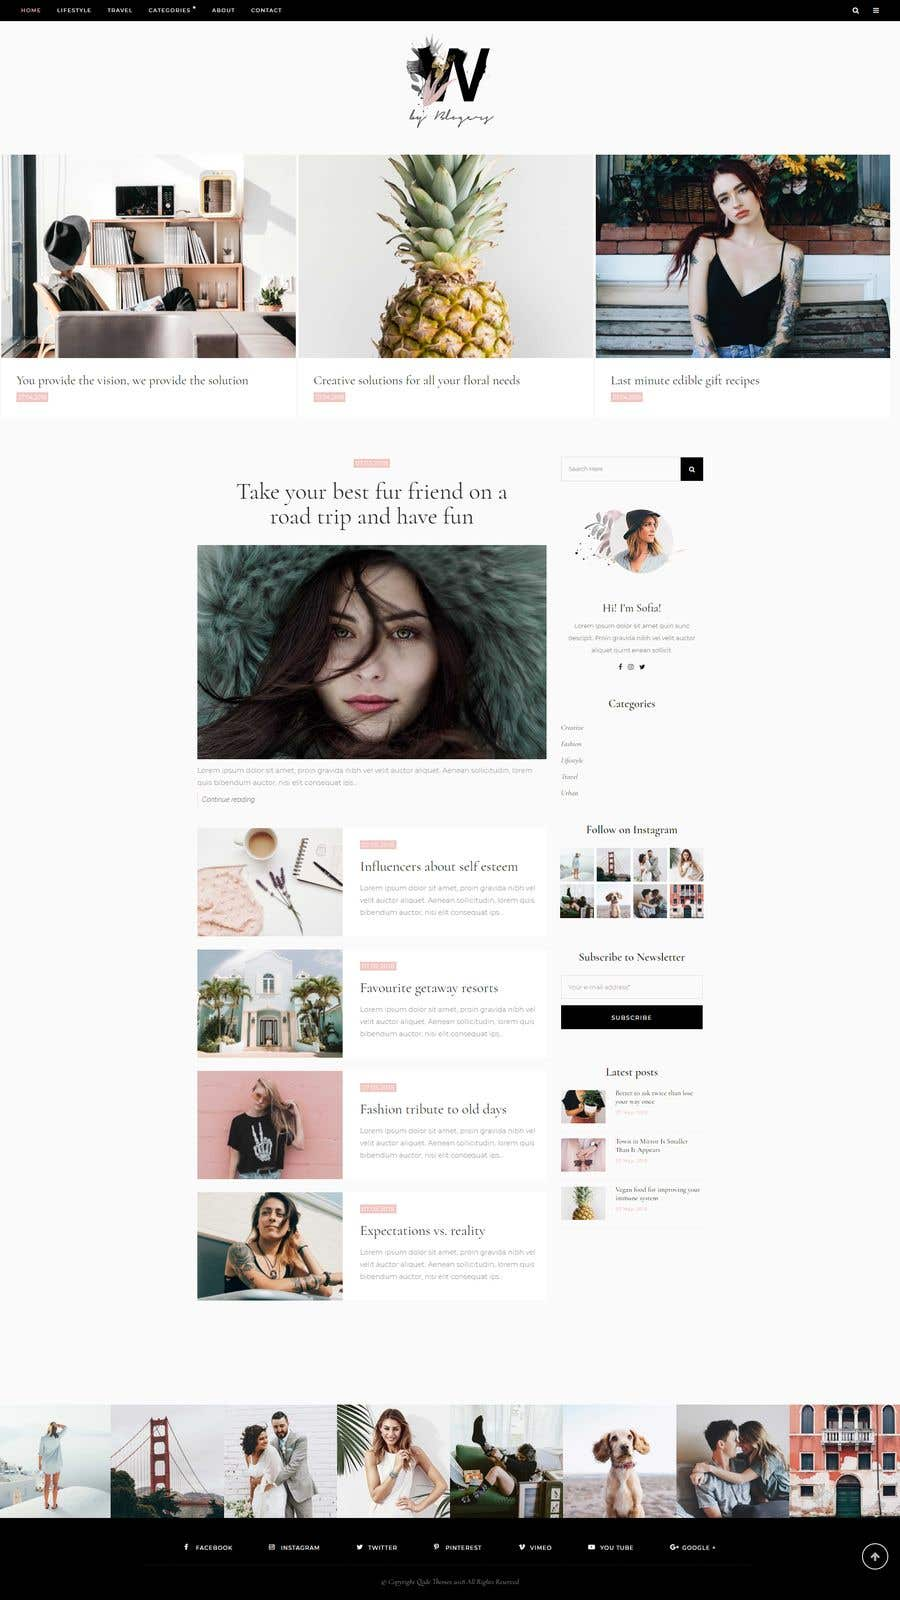 Konkurrenceindlæg #14 for Build A Blog - Design a Brand